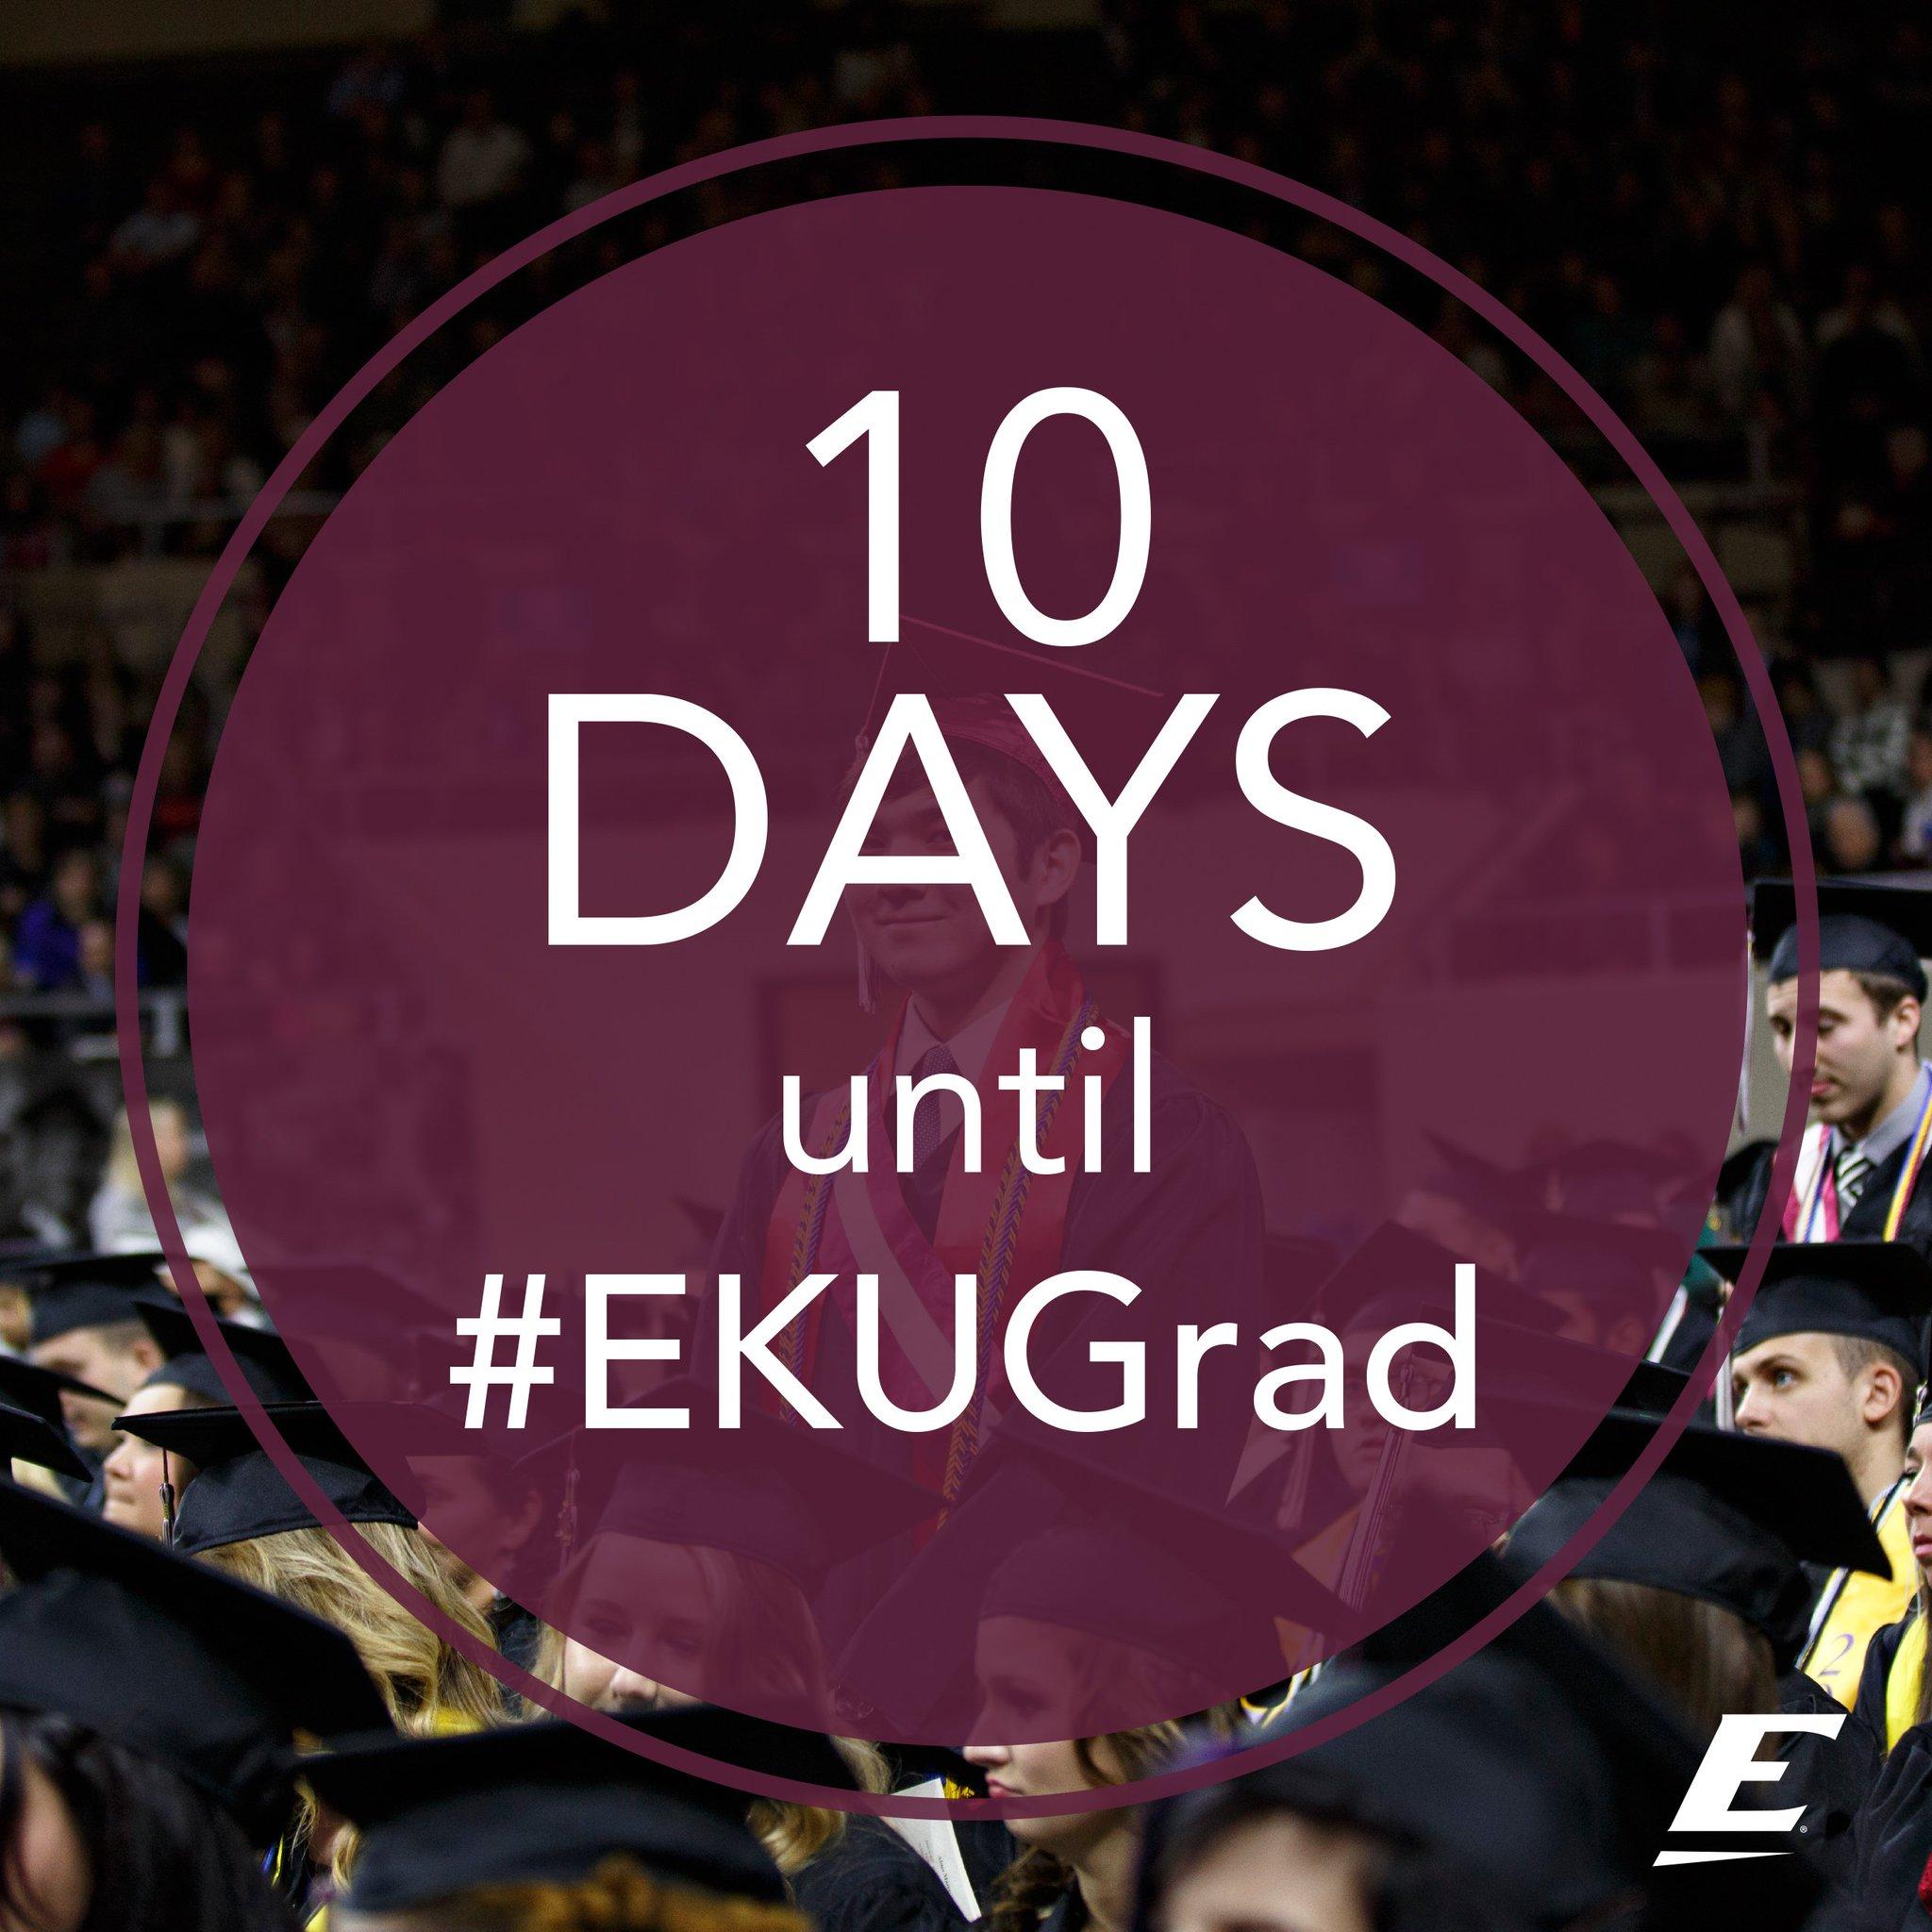 10 days until #EKUGrad! https://t.co/F0PC3eFHdW